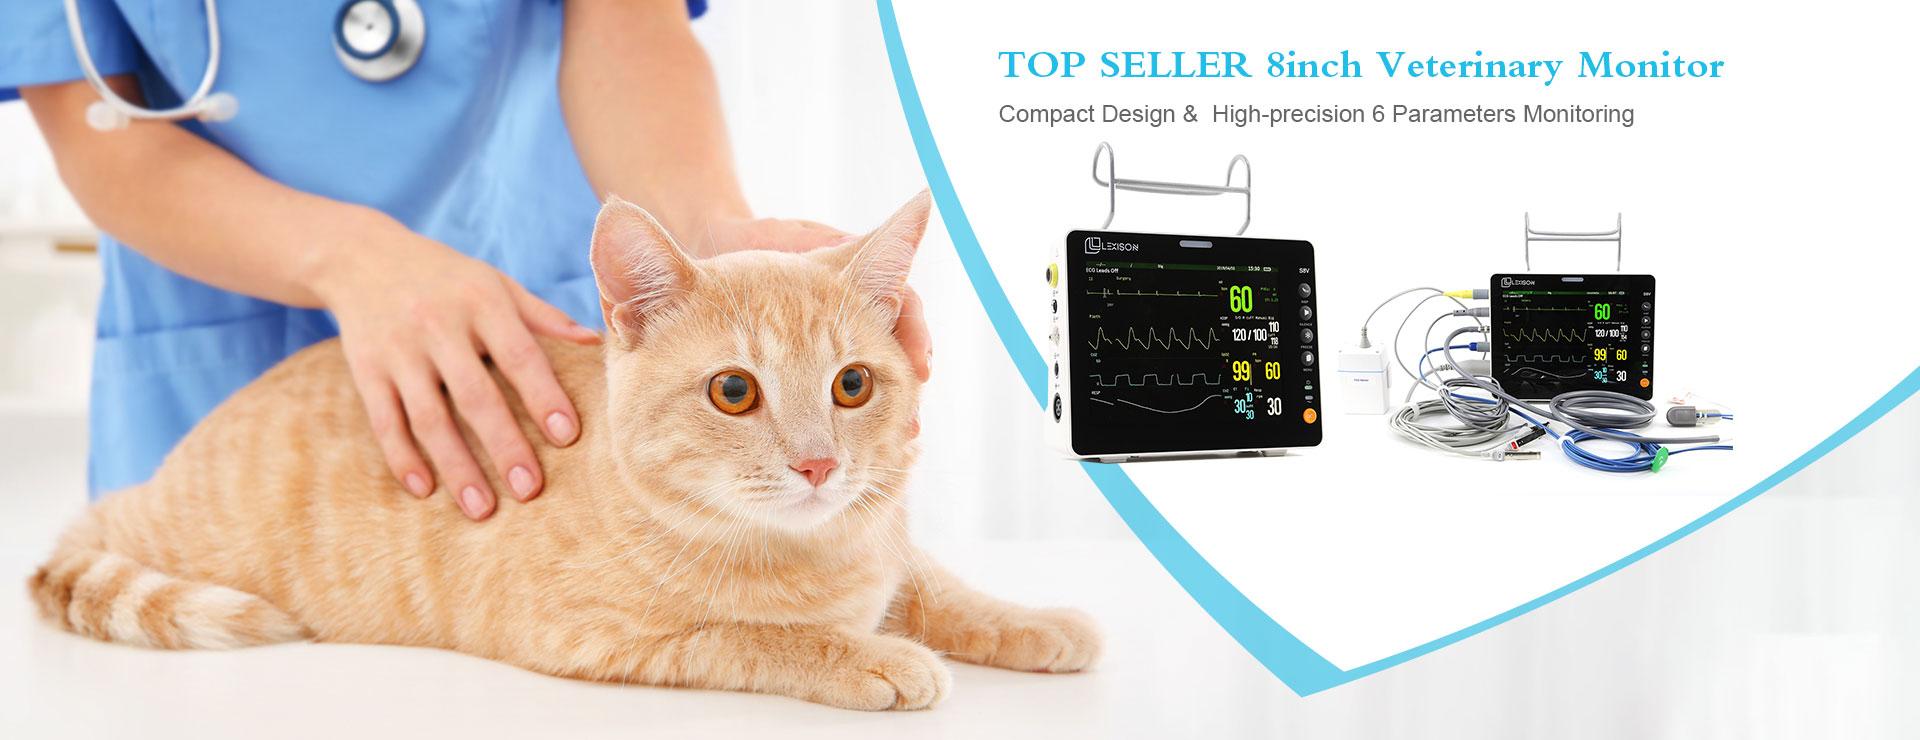 Veterinary Monitor